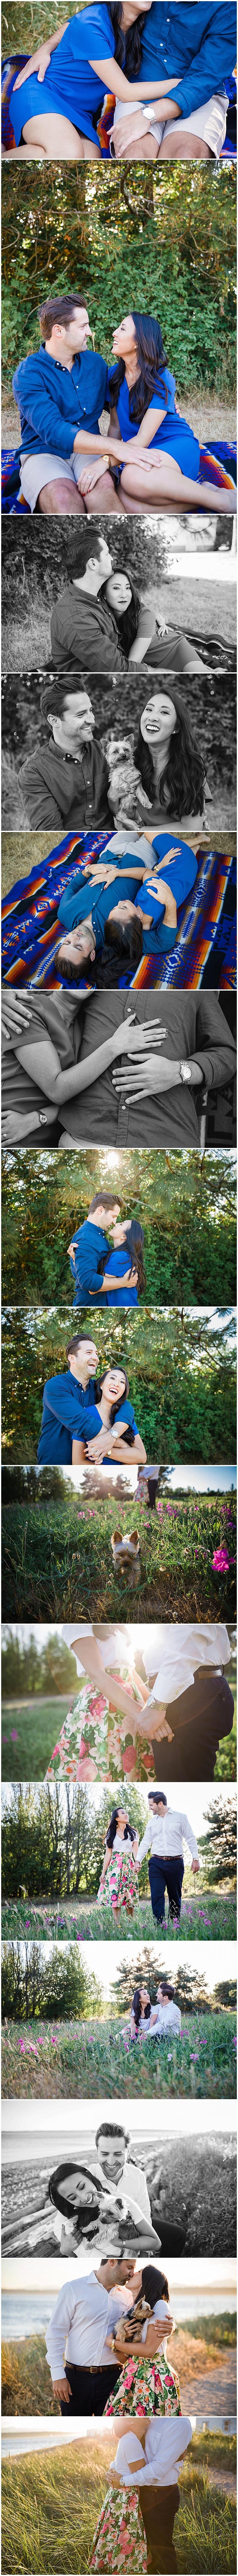 Keaton + Vivian // Seattle Engagement Photographer